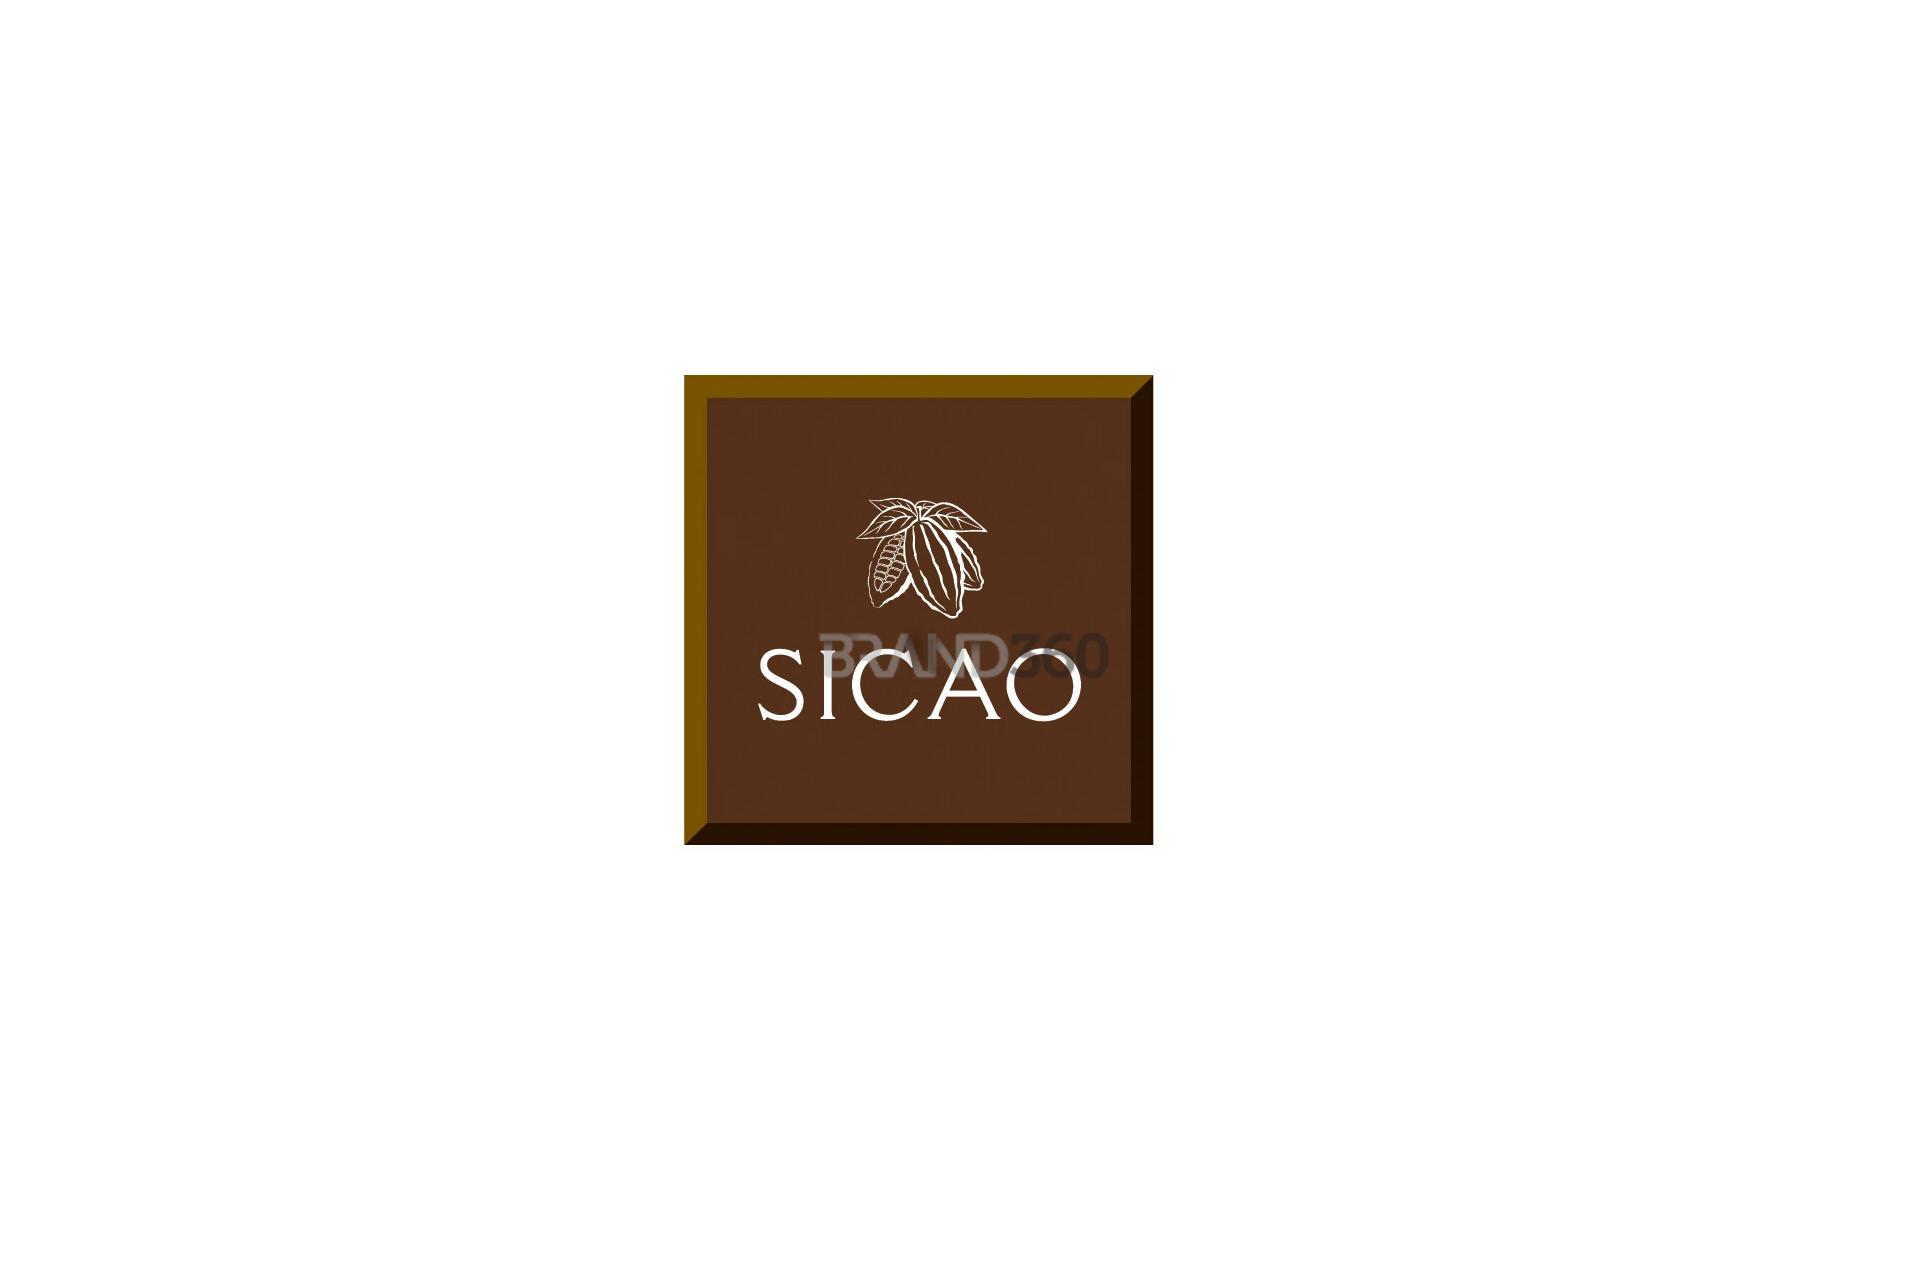 sicao-newlogo-1920